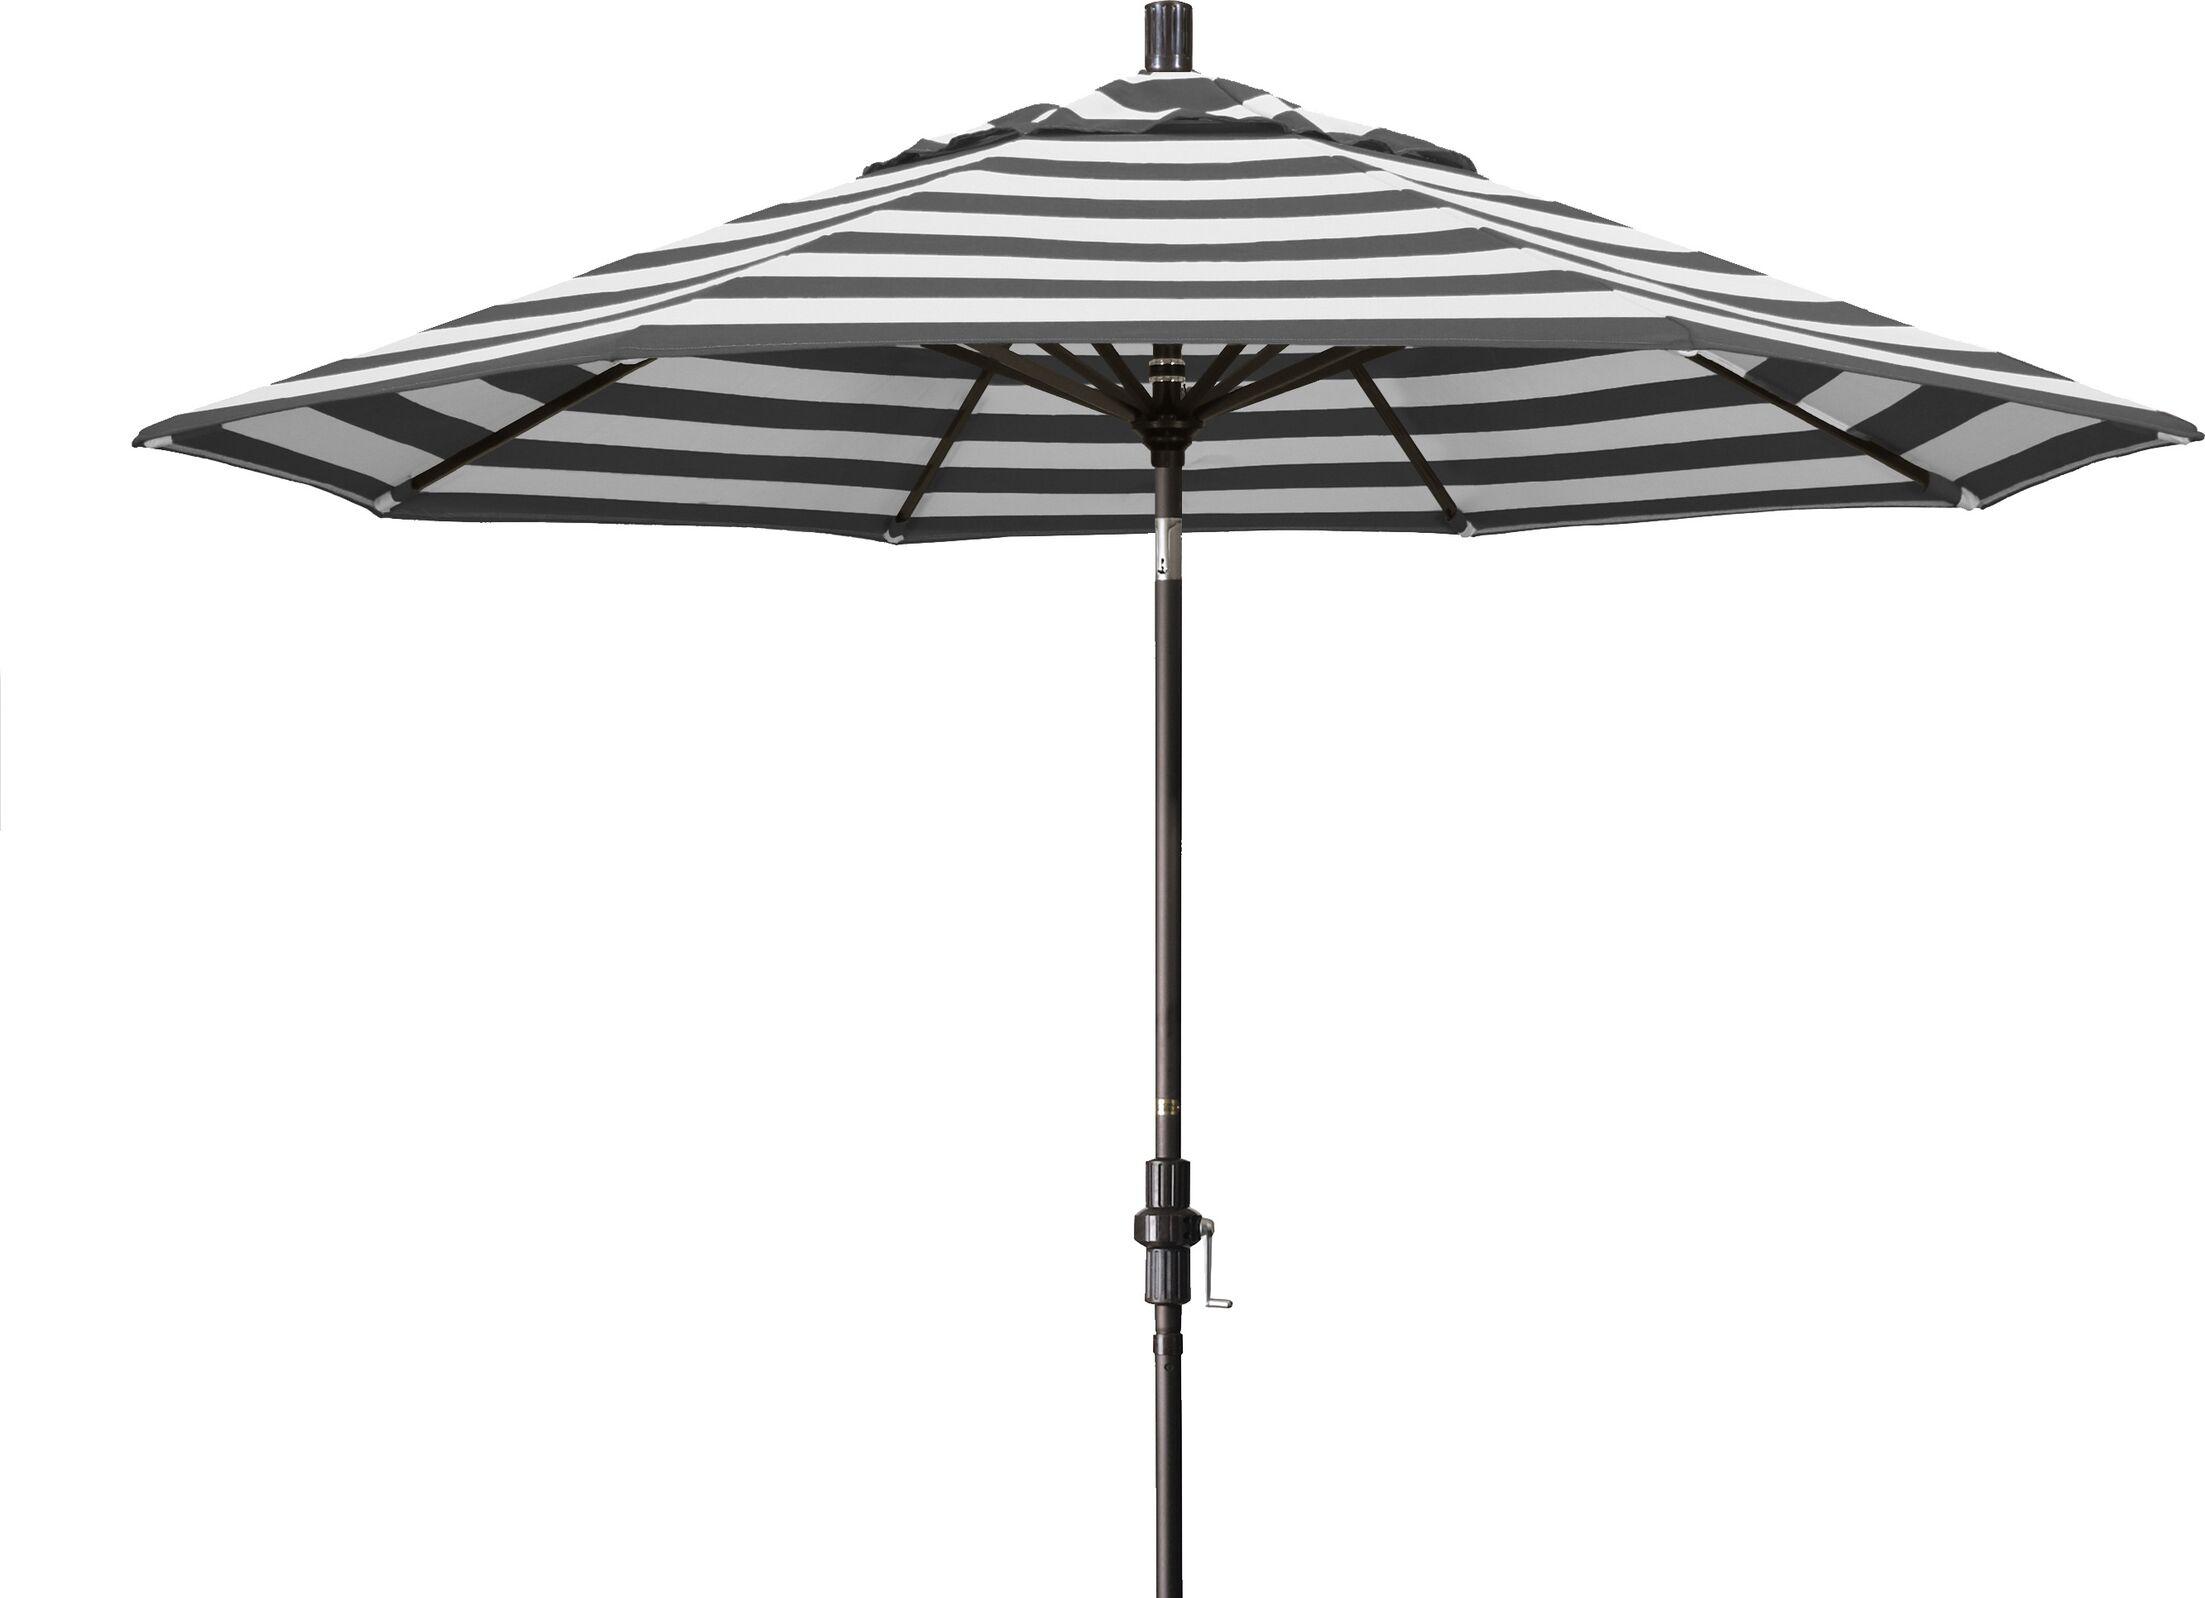 9' Market Umbrella Frame Color: Bronze, Fabric Color: Classic